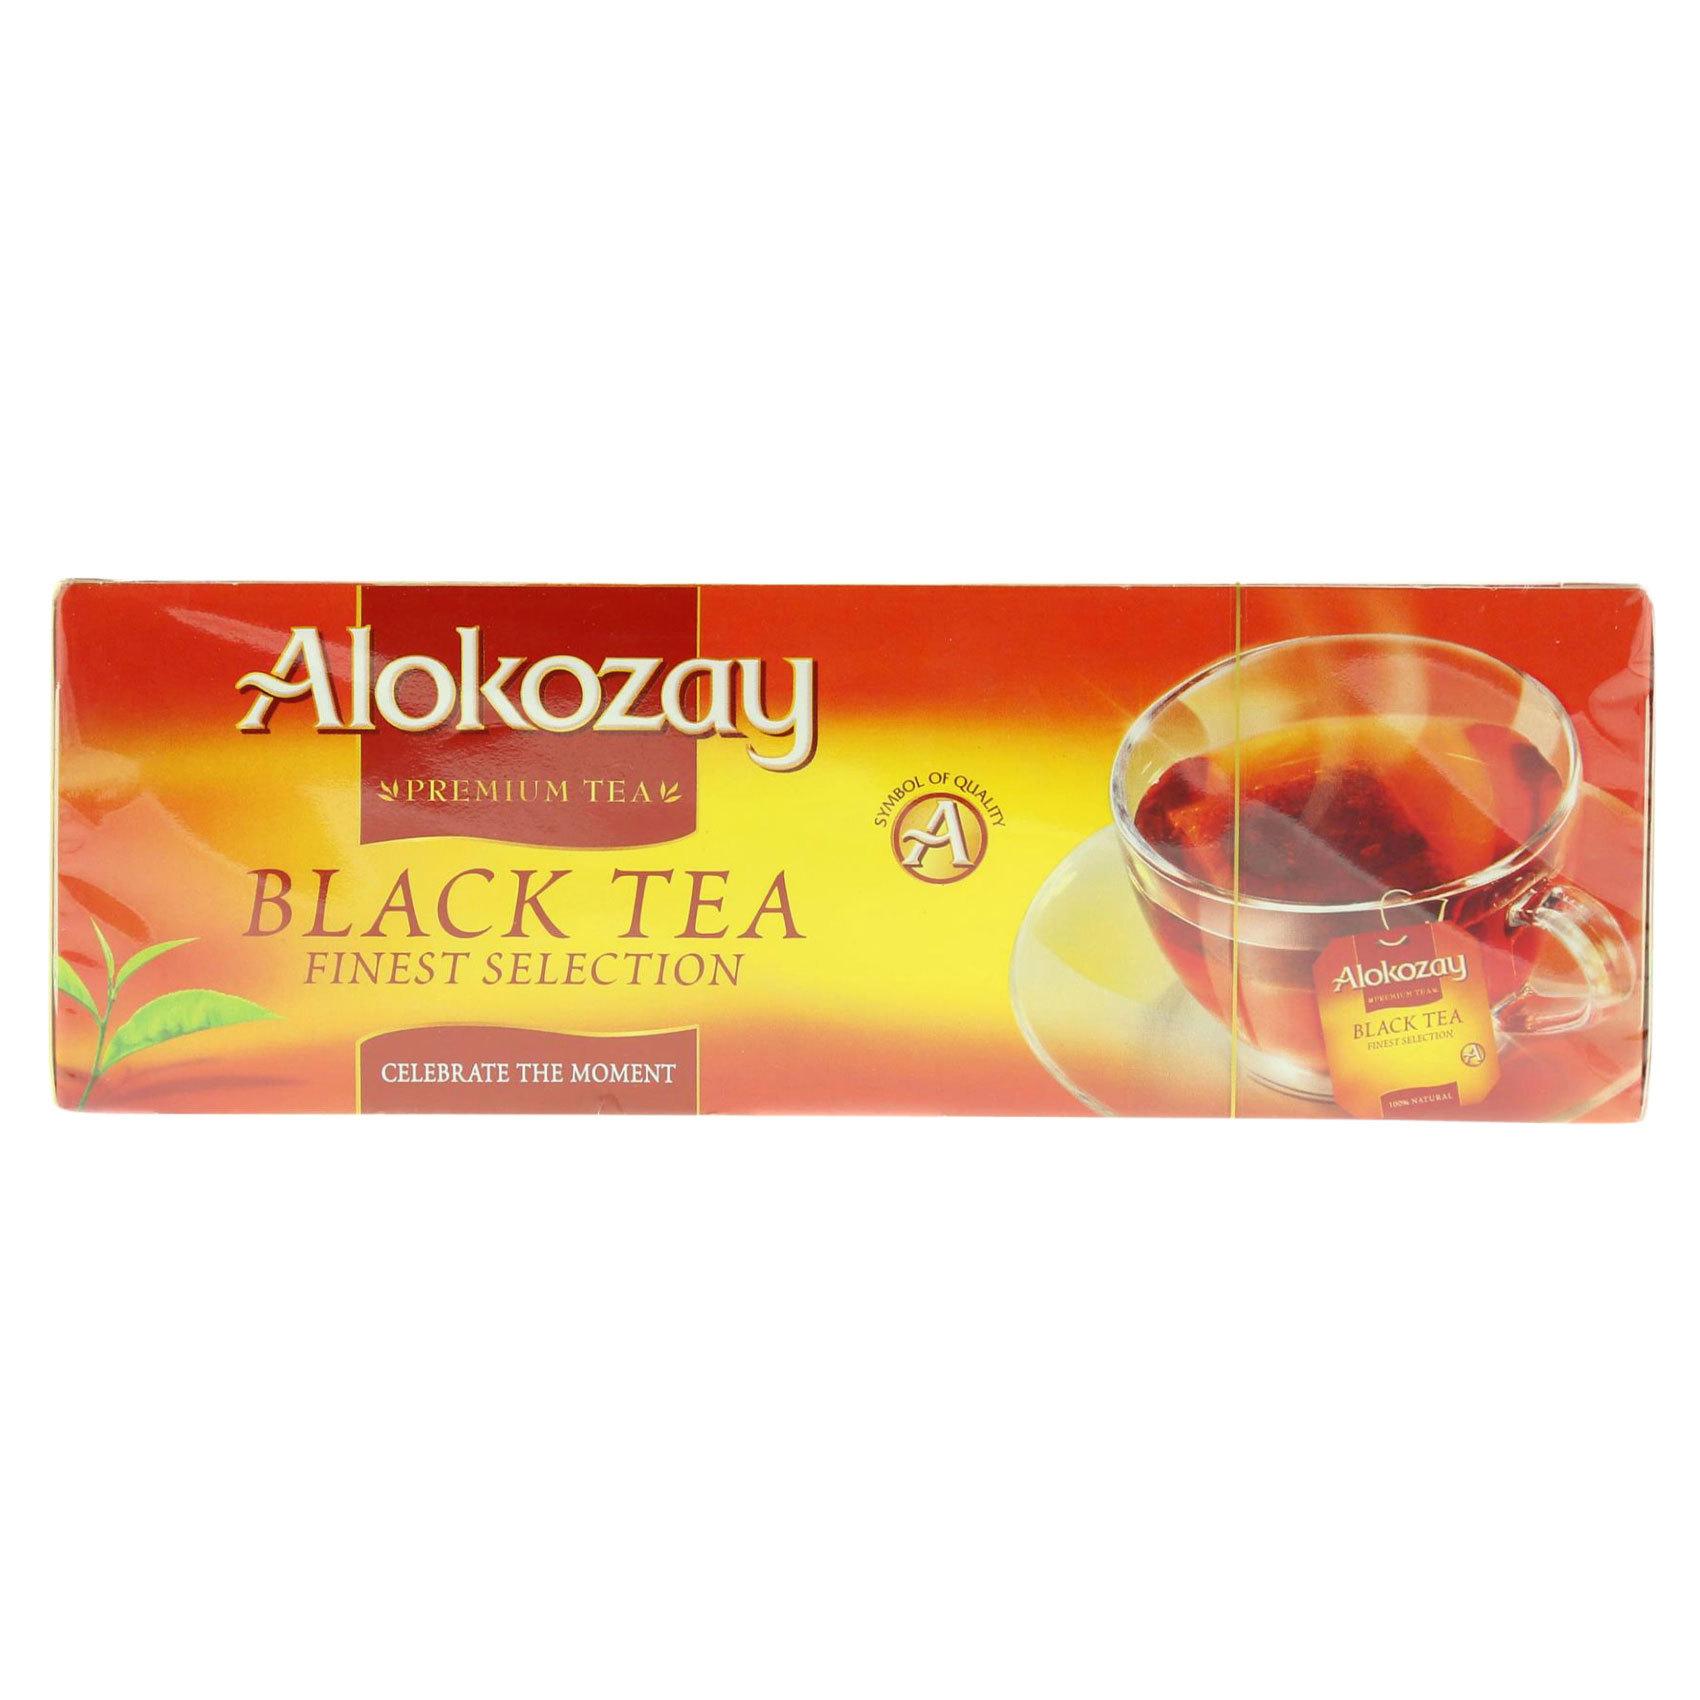 ALOKOZAY BLACK TEA PREMIUM 100'S